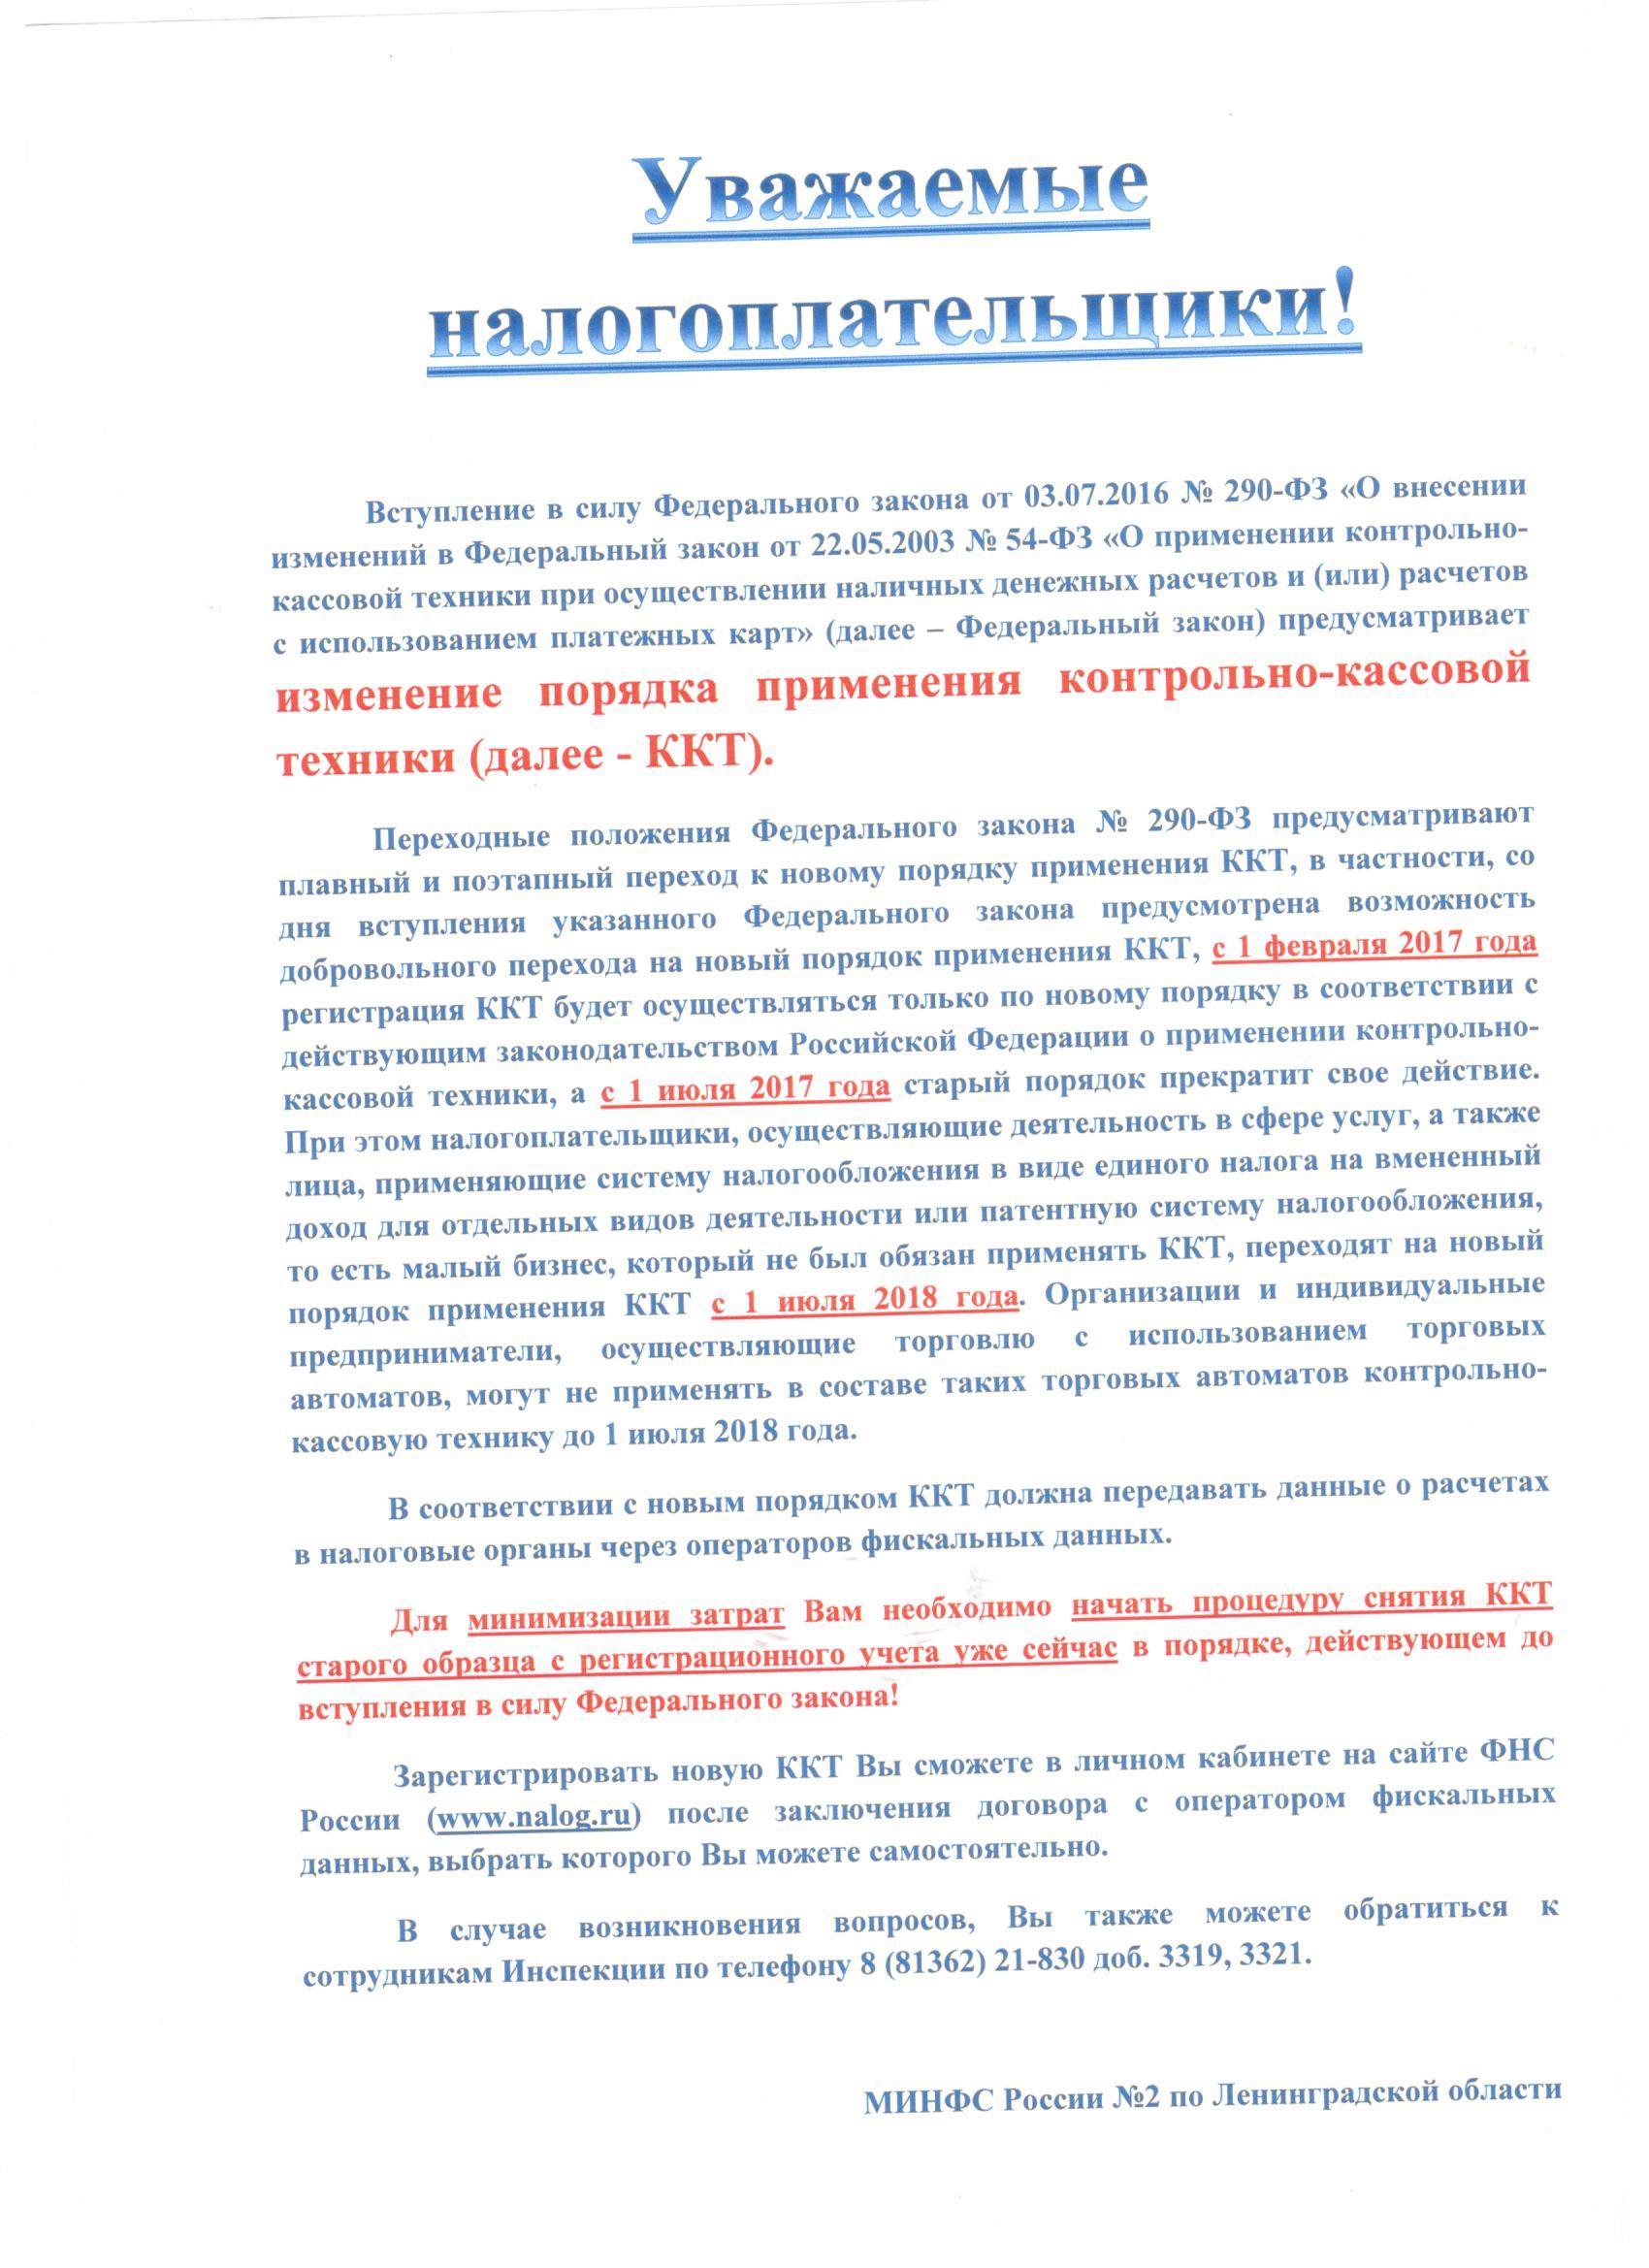 бланк справки № ндфл в петрозаводске